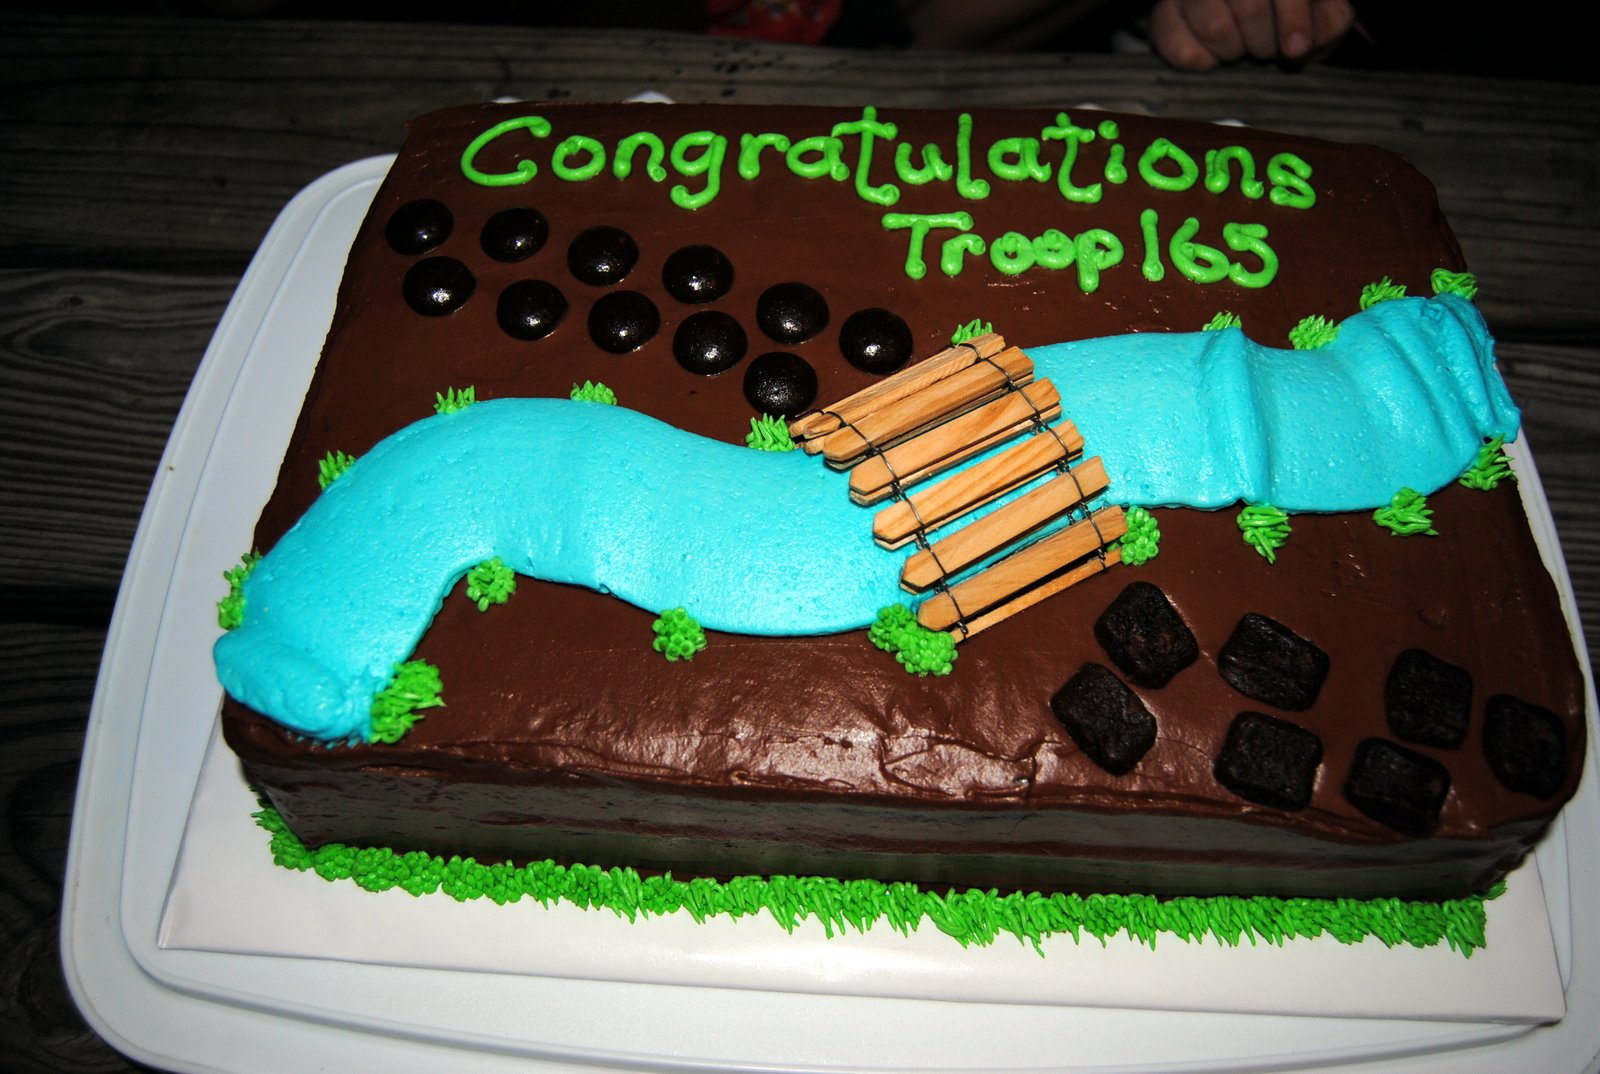 Late Night Cakes Girl Scout Bridge Ceremony Cake